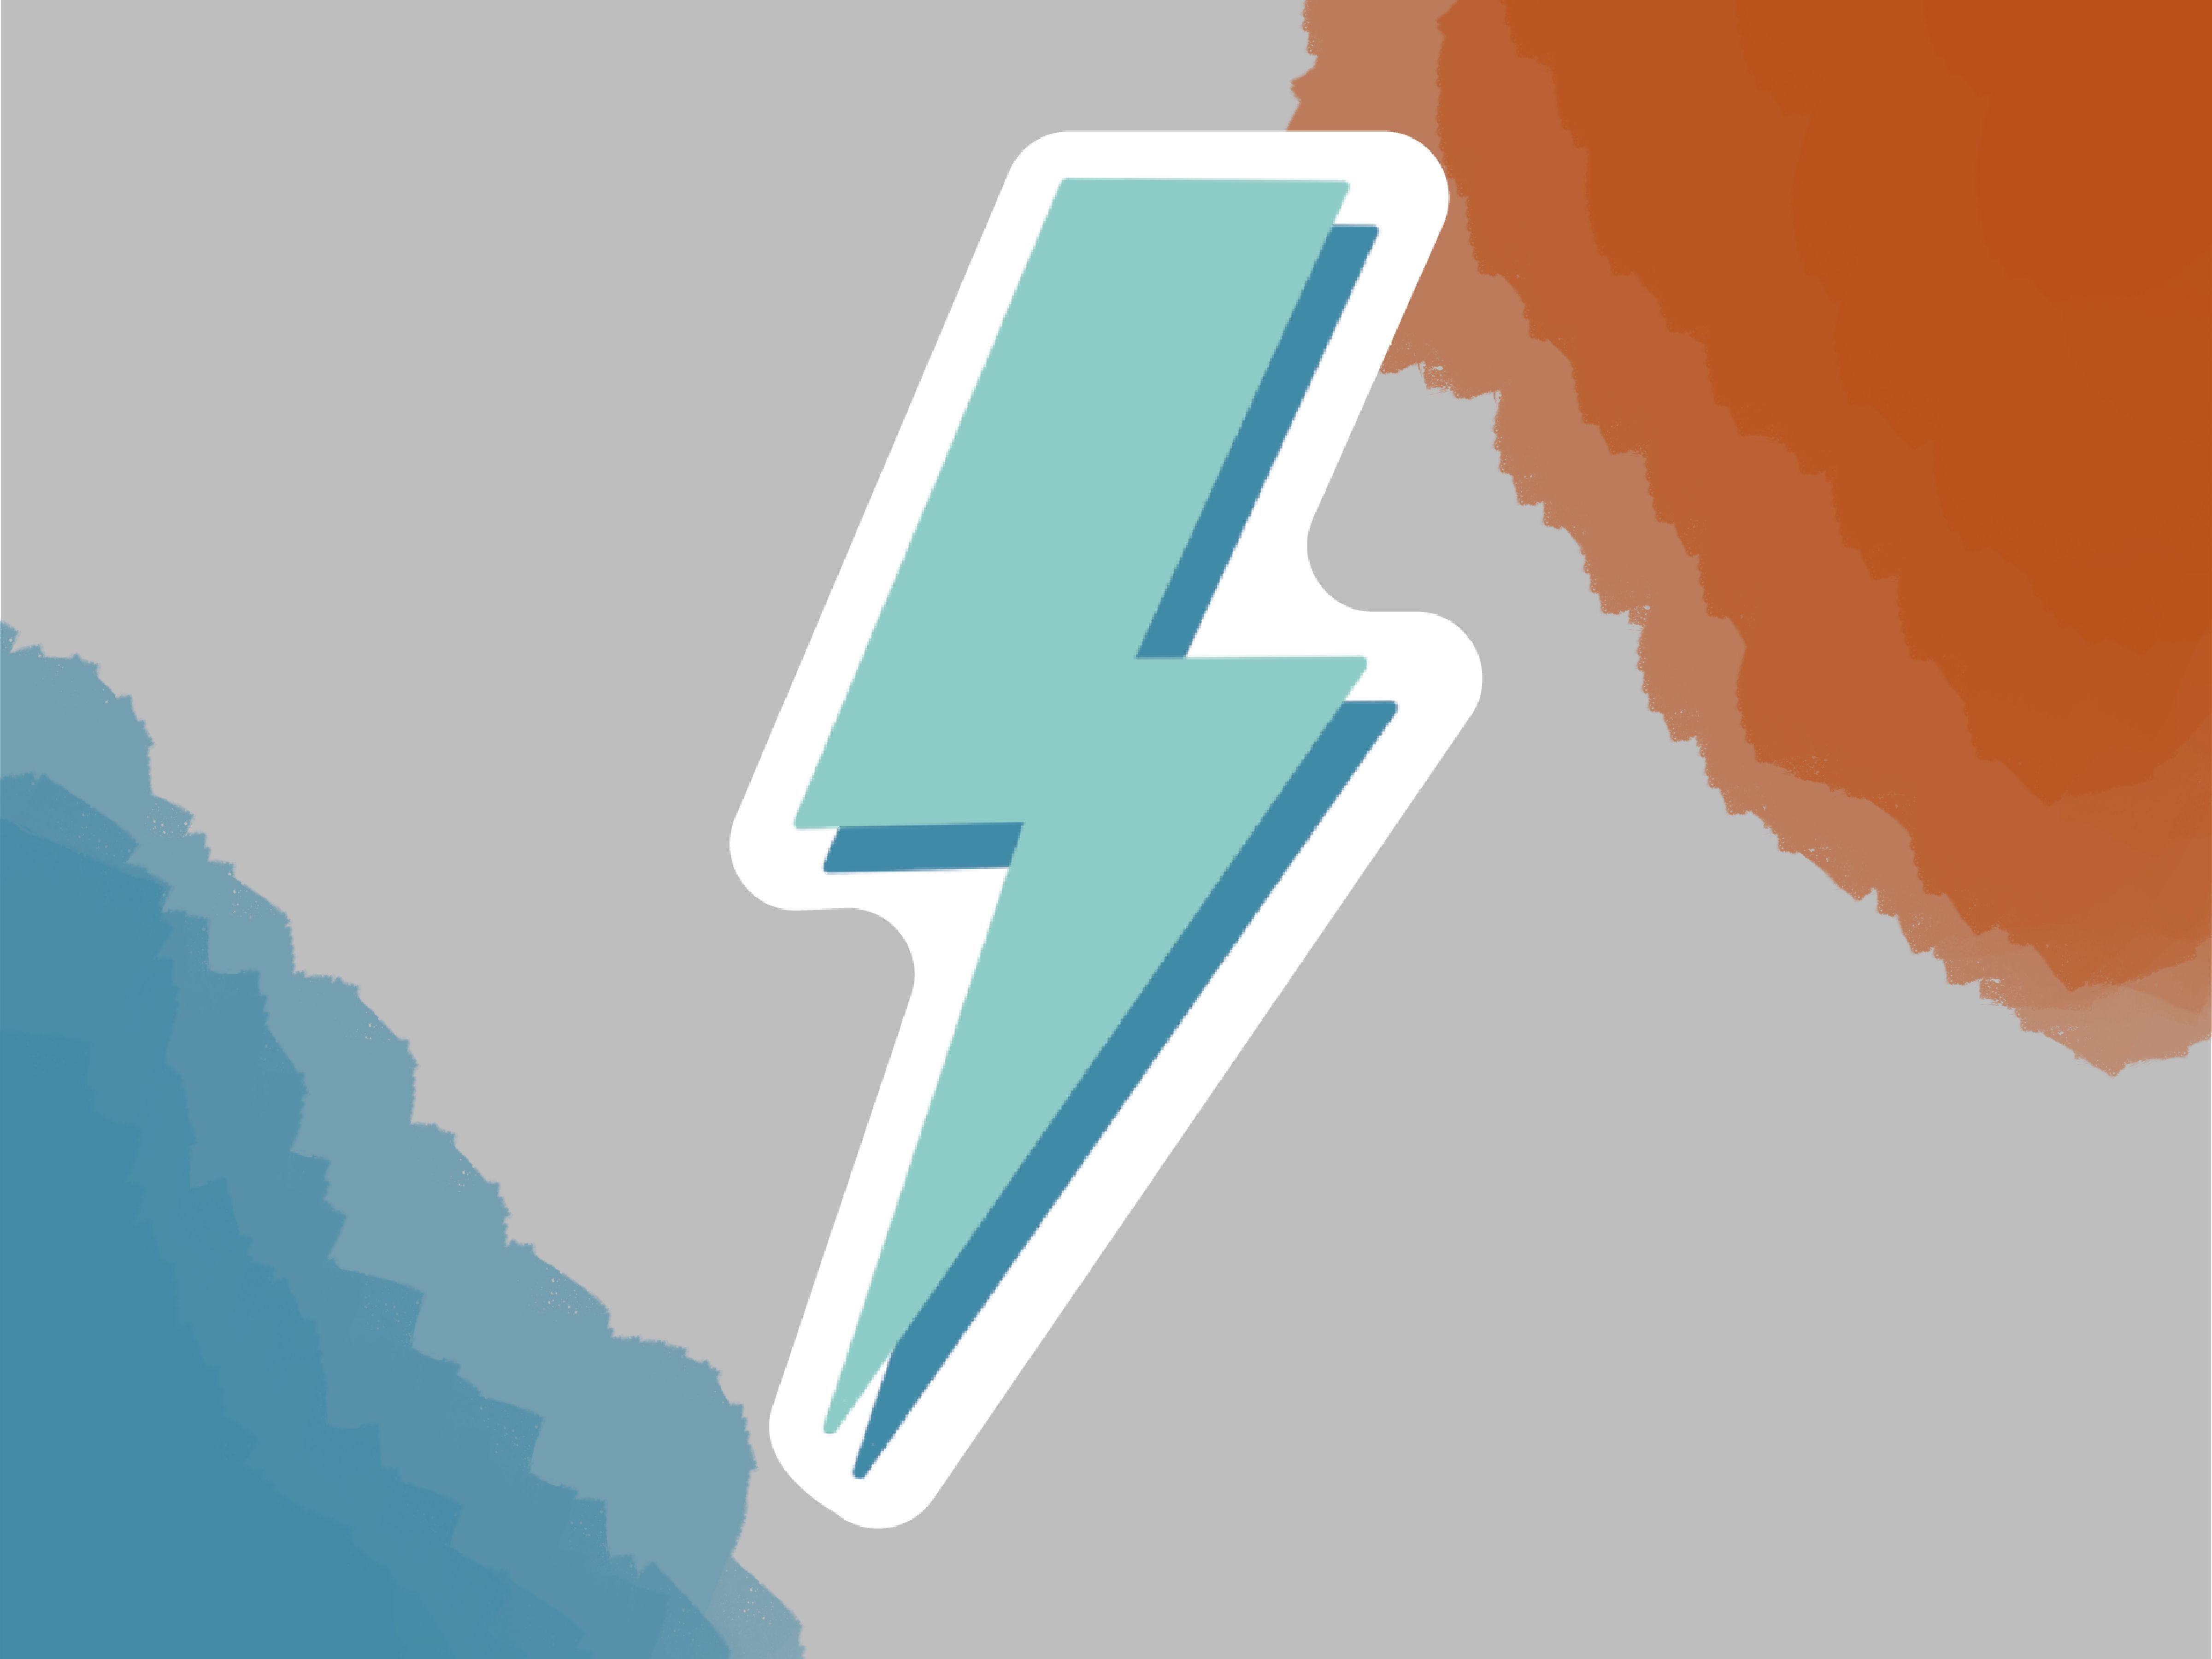 Two Tone Lightning Bolt Sticker Lightning Bolt Glossy Paper Lightning